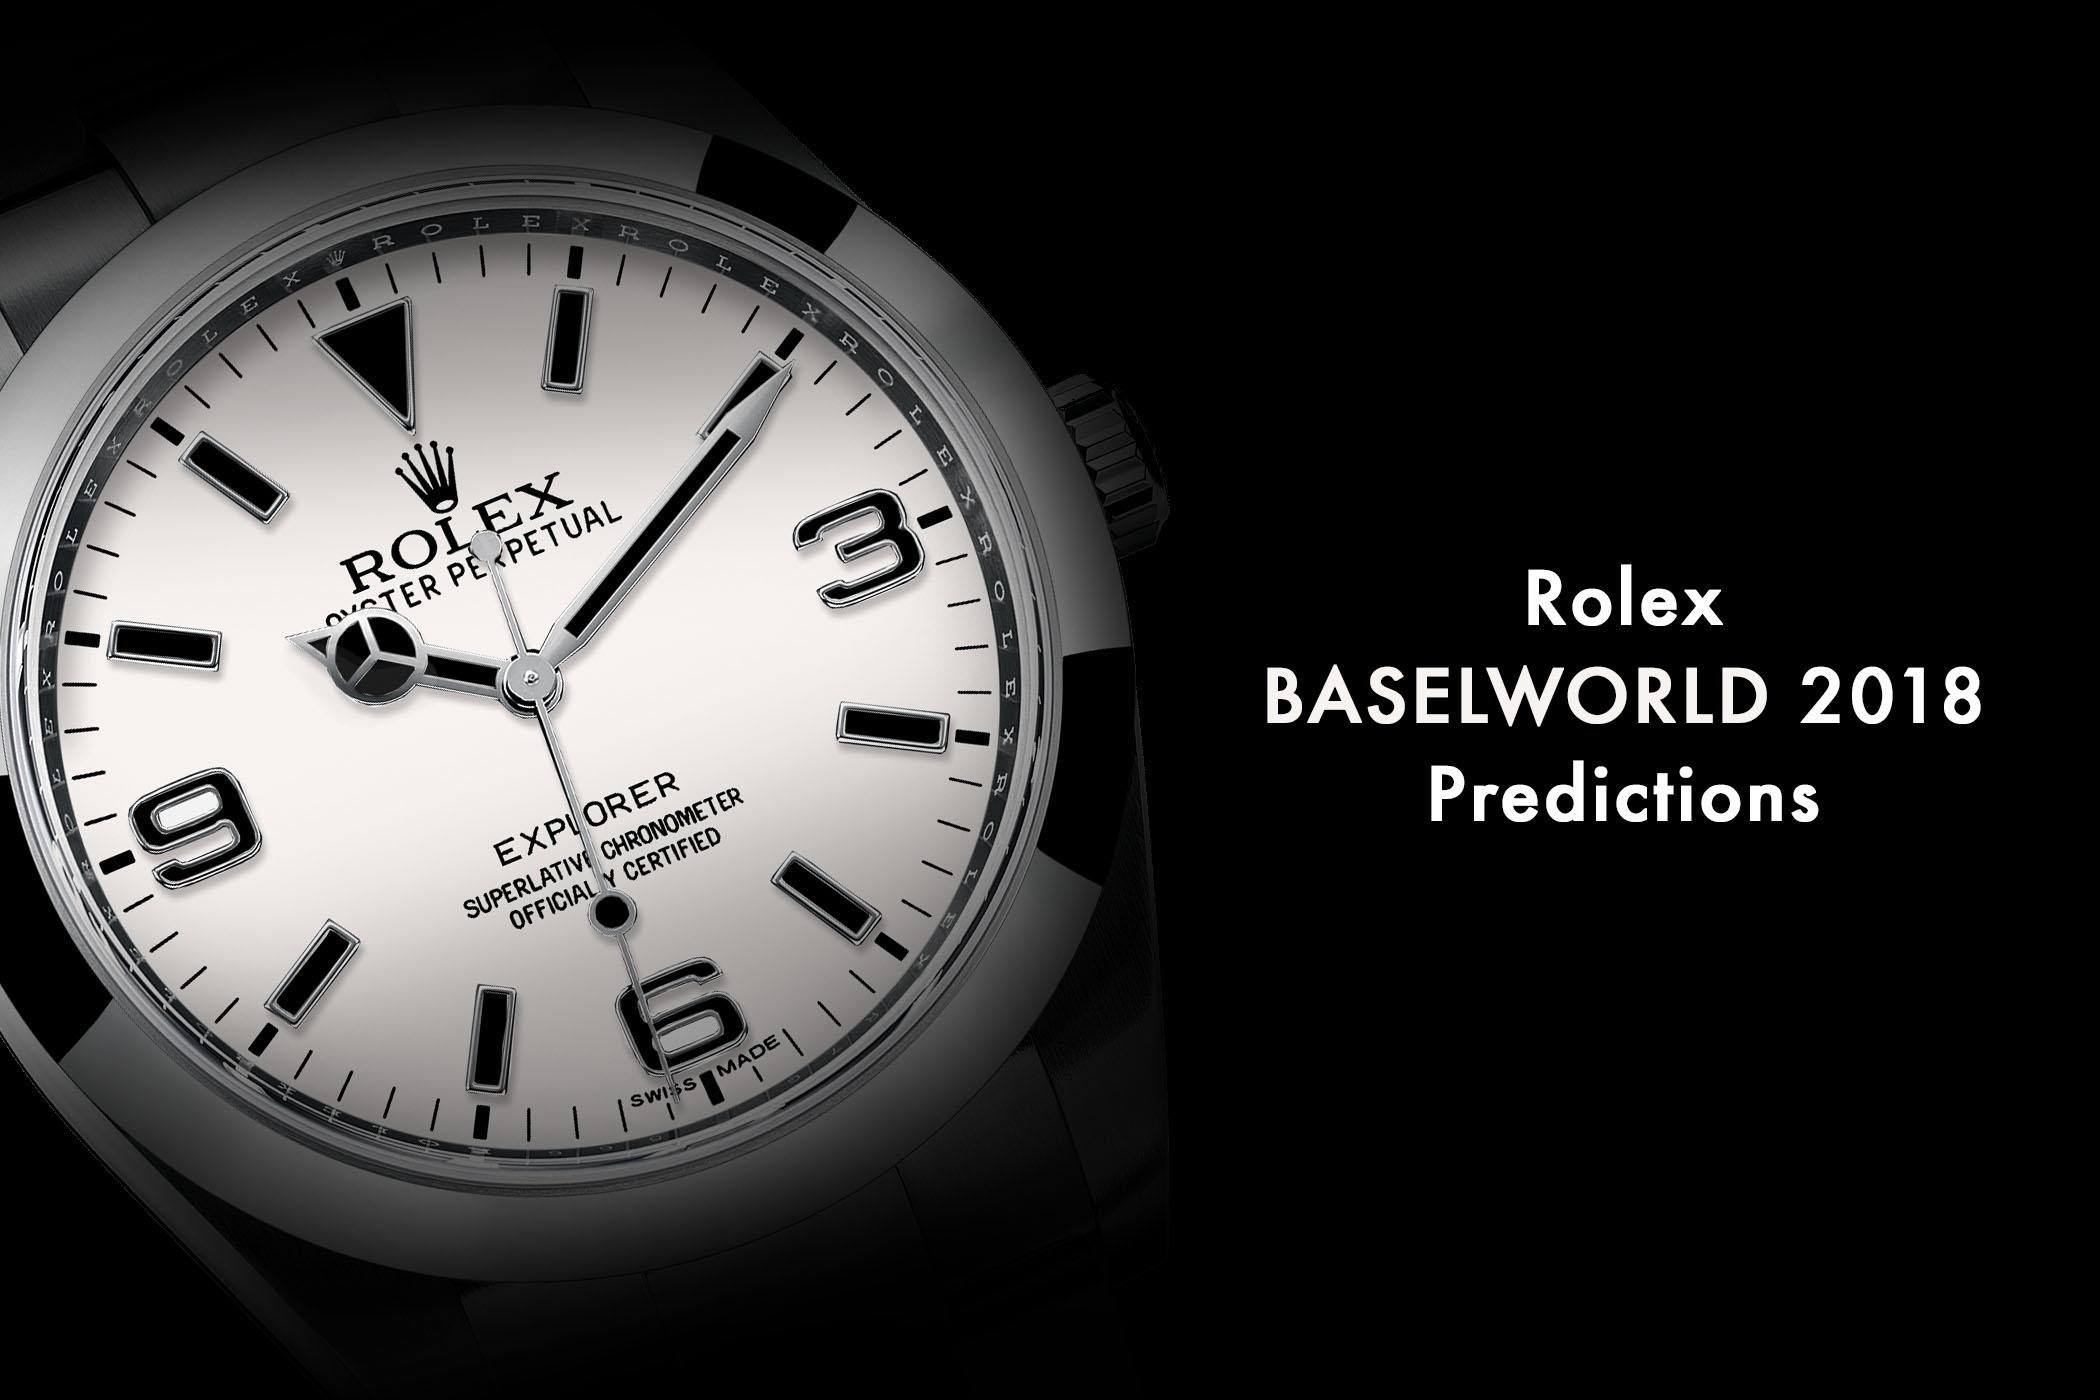 Rolex Baselworld 2018 - Rolex Predictions 2018 - Rolex Novelties 2018